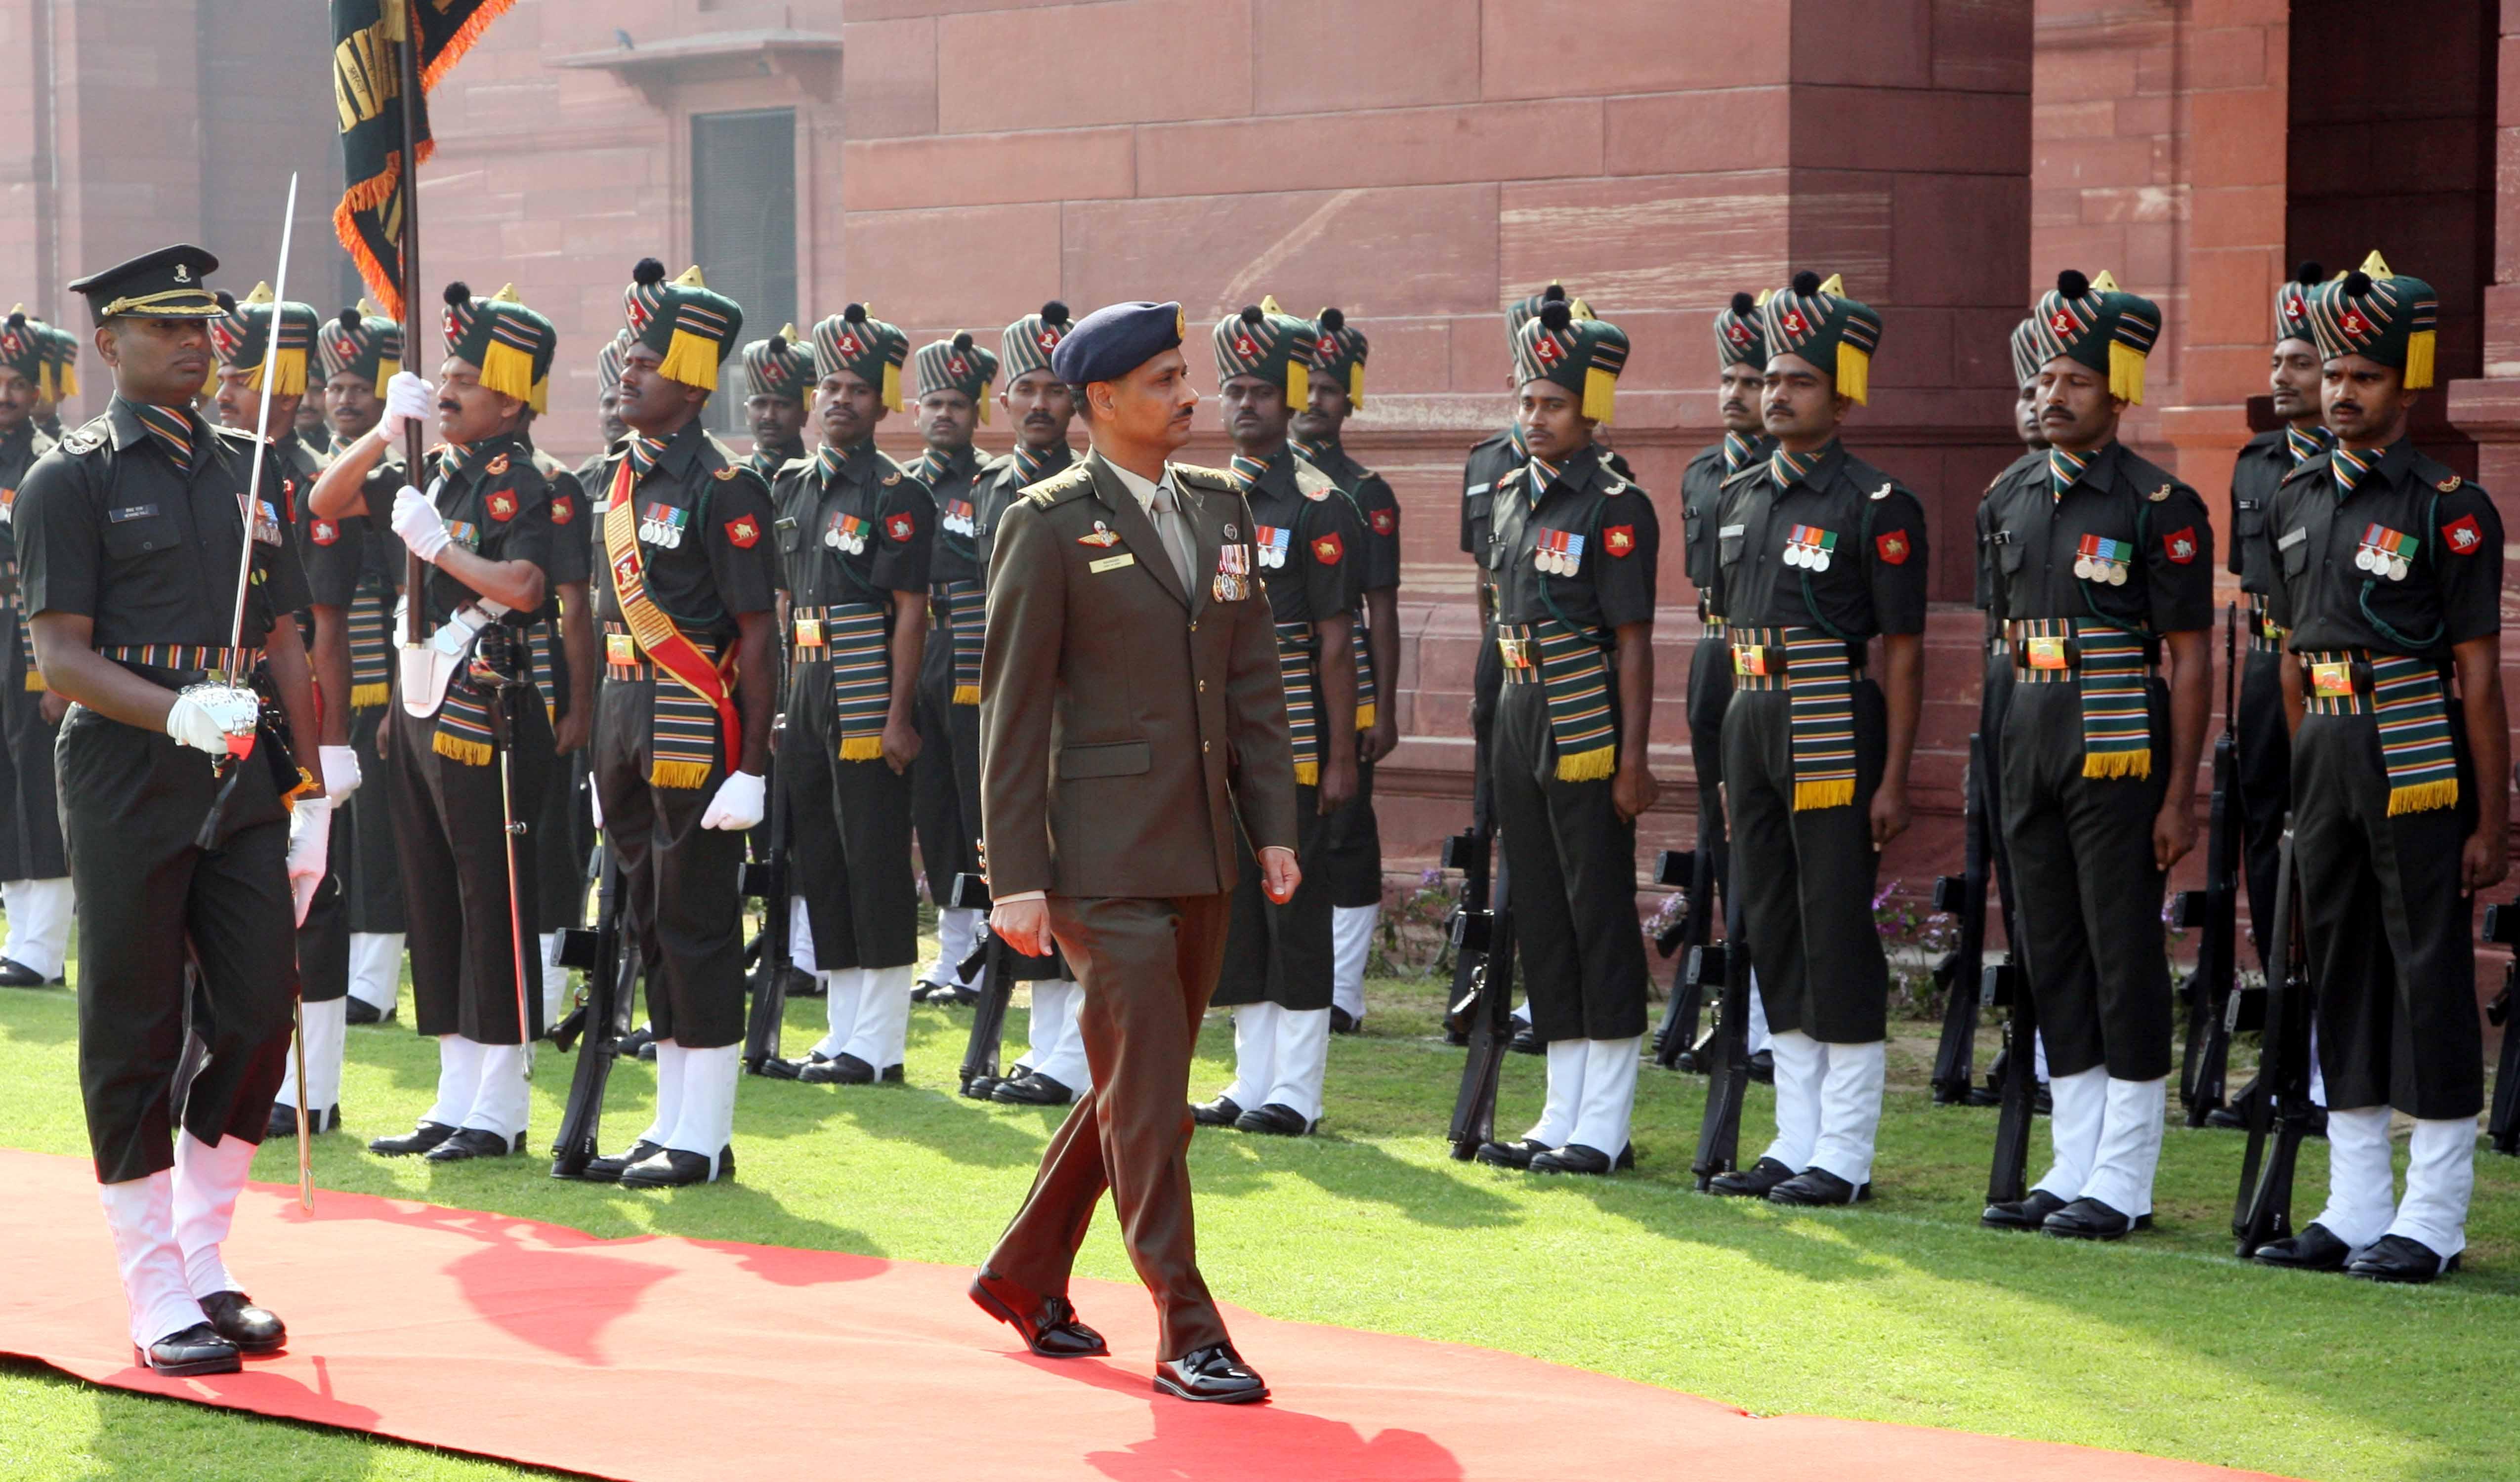 Maj Gen Ravinder Singh COA Singapora Army Inspecting Guard of Honour